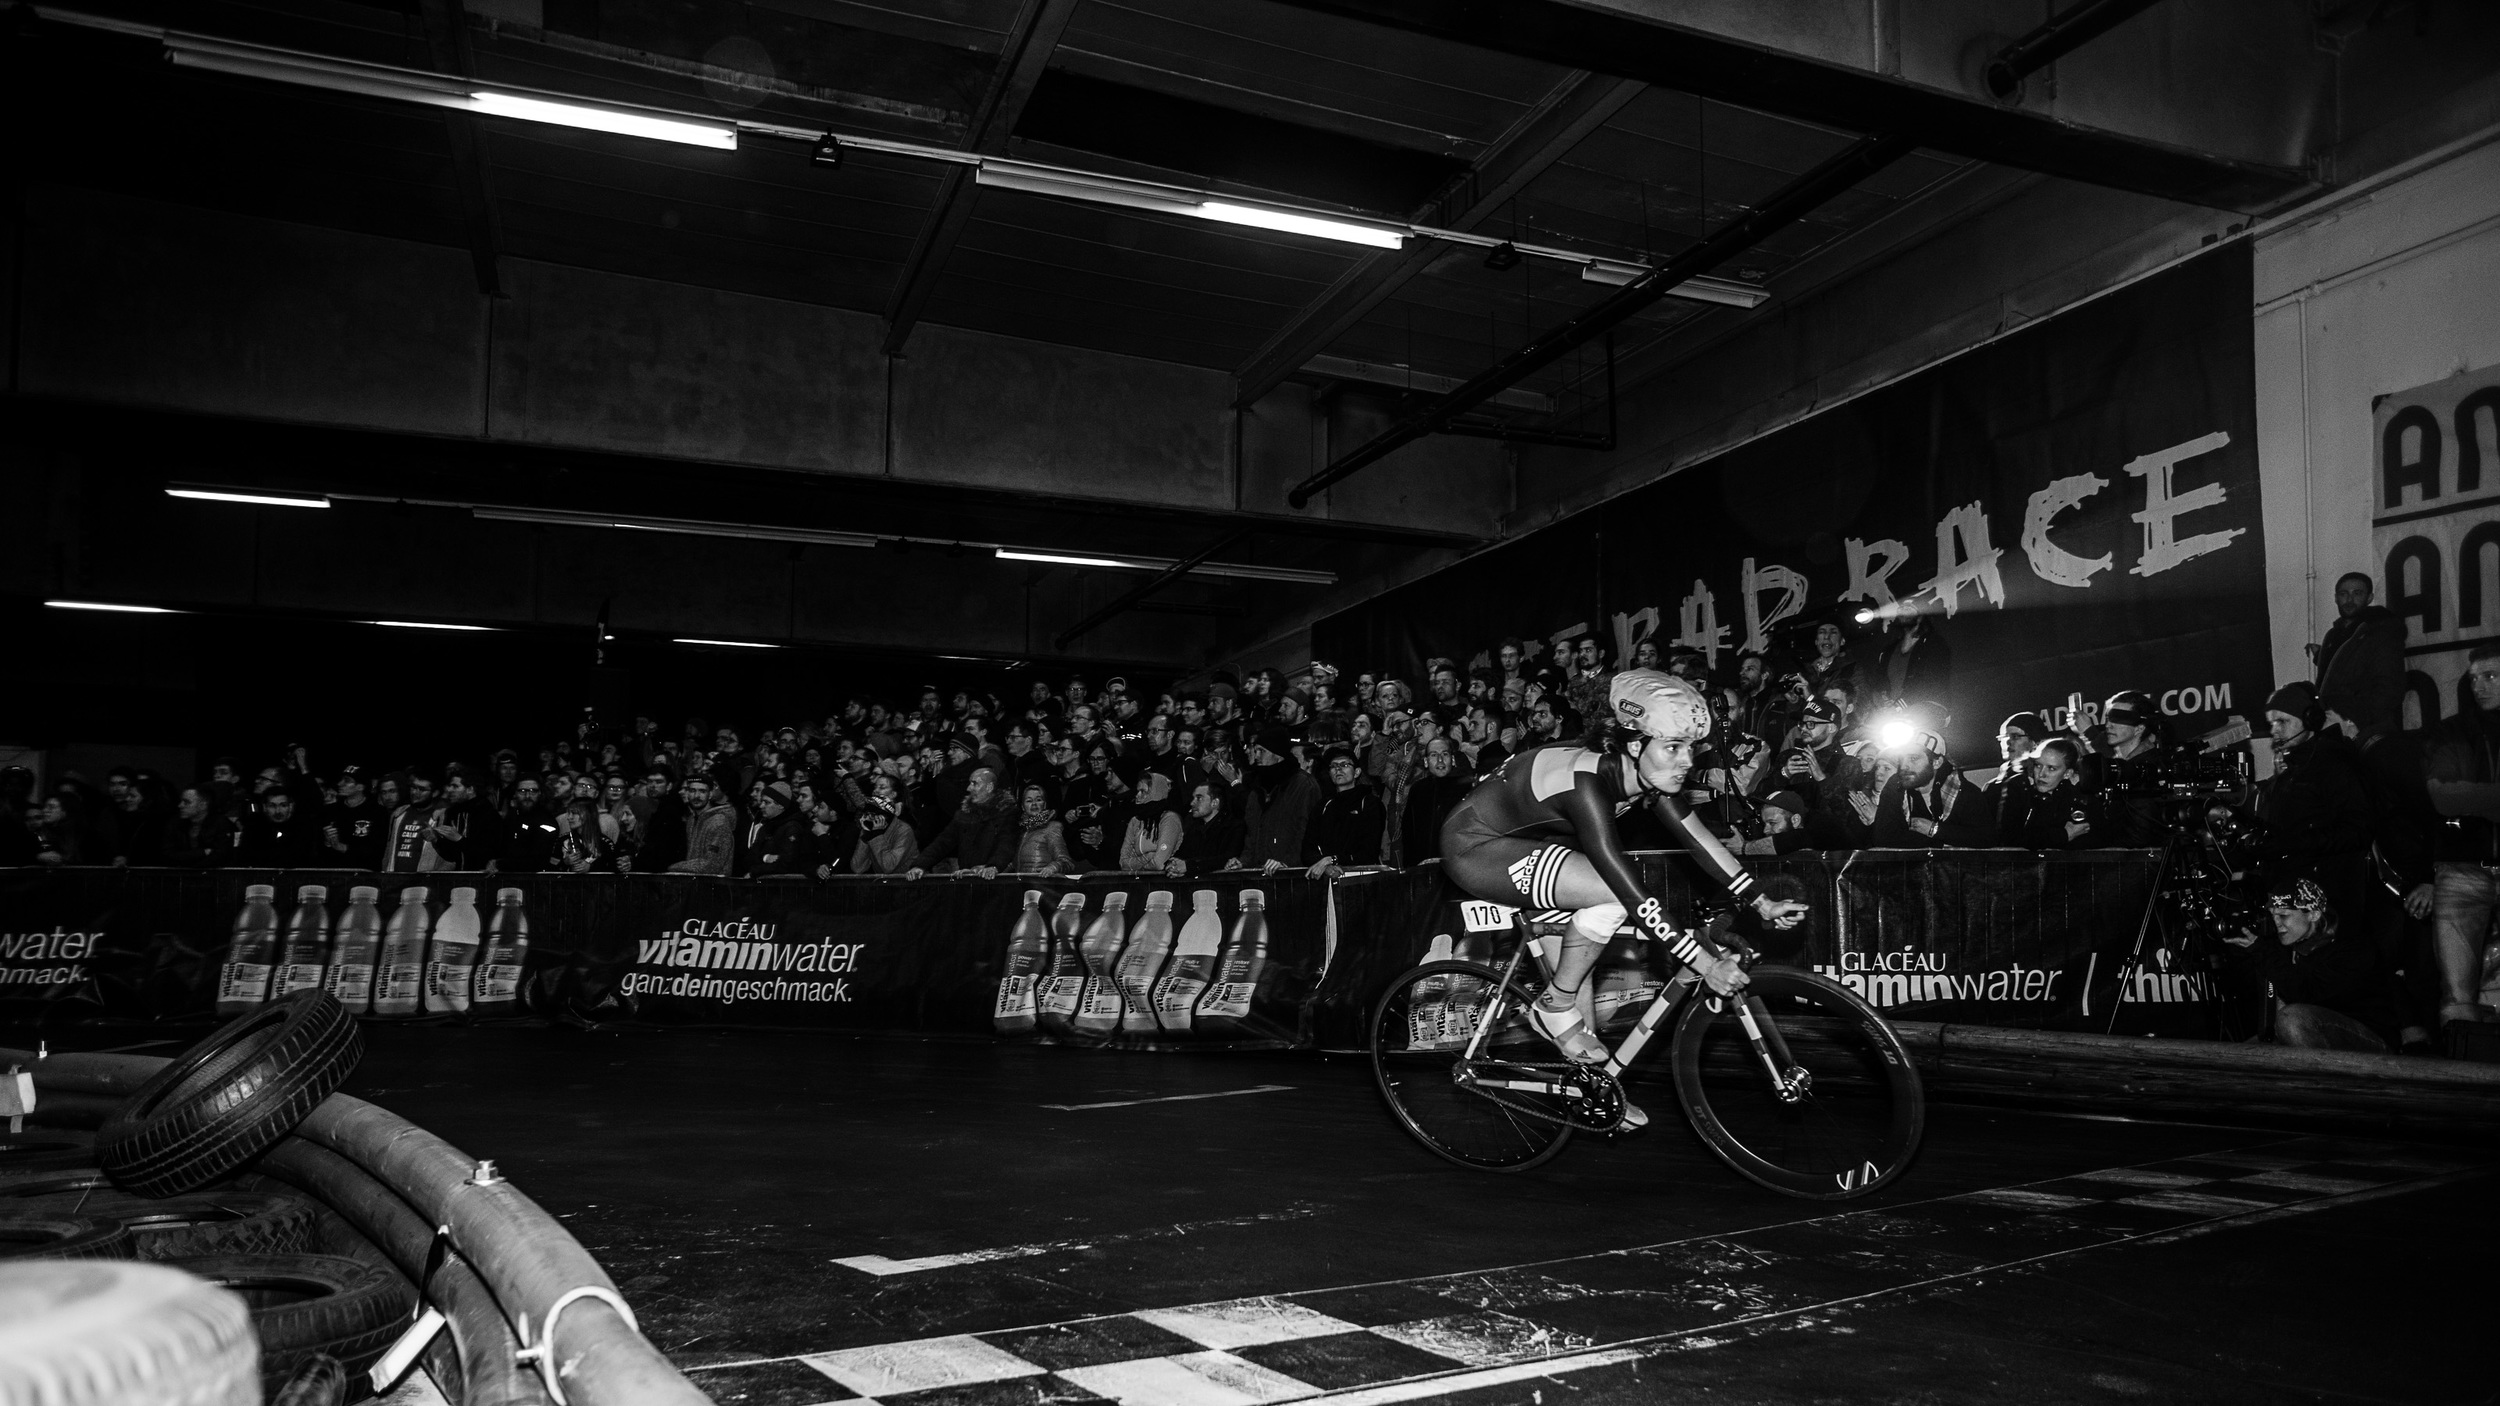 RAD RACE Last Man Standing, Berlin March 19 2016 - Shot by Drew Kaplan 57.jpg